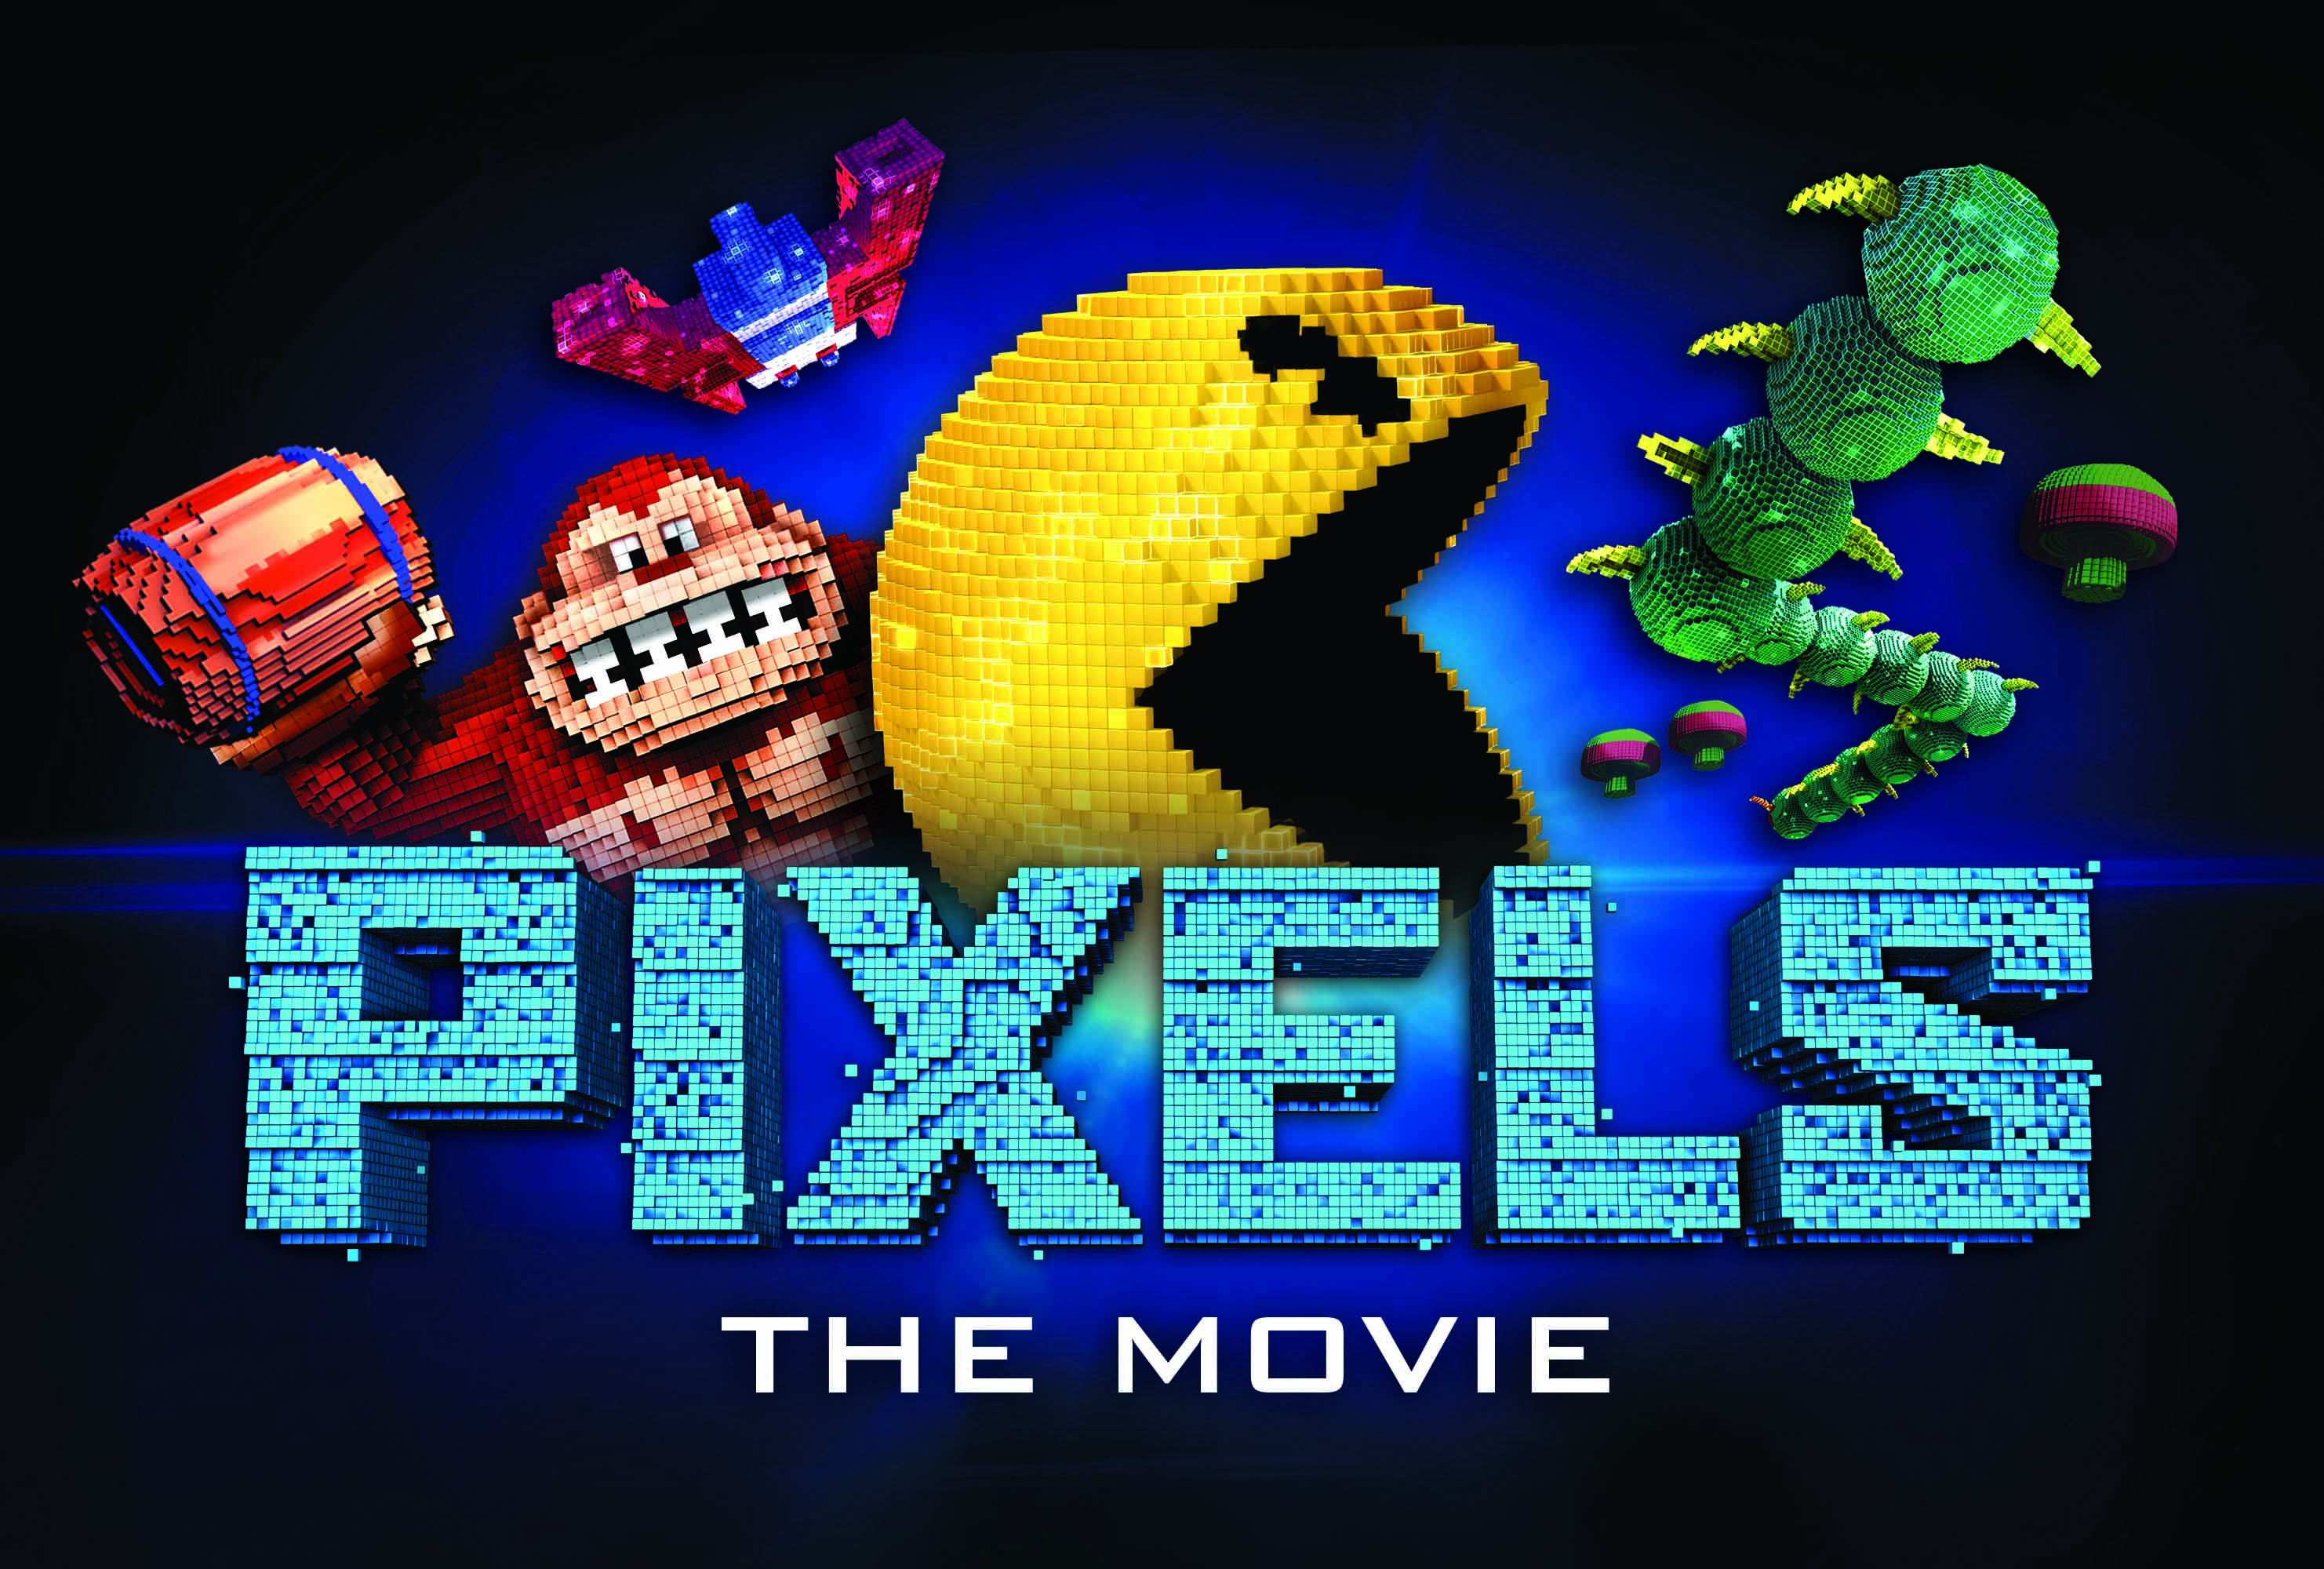 Pixels: Test Your Memory v1.0 Immagini